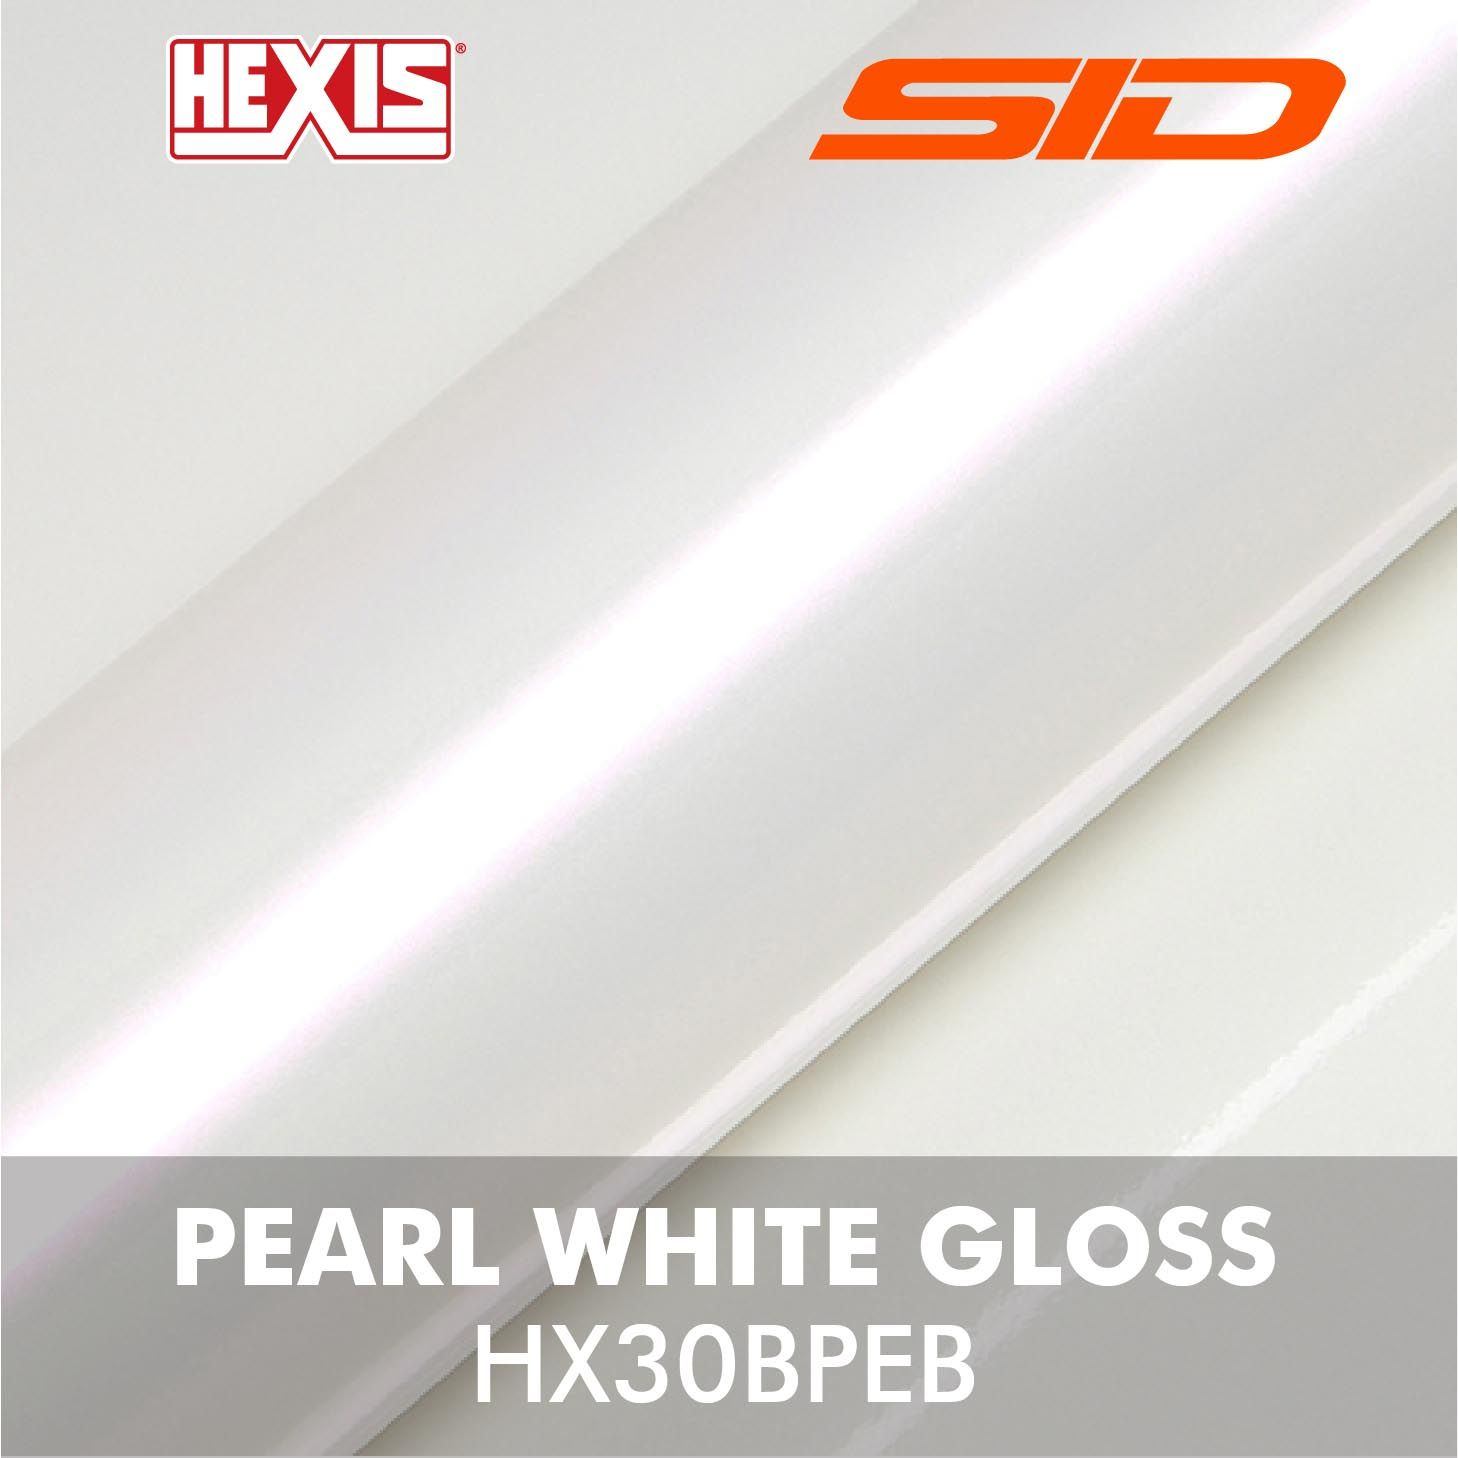 HEXIS - Série HX30000 - Metro Linear na Largura de 1,52m